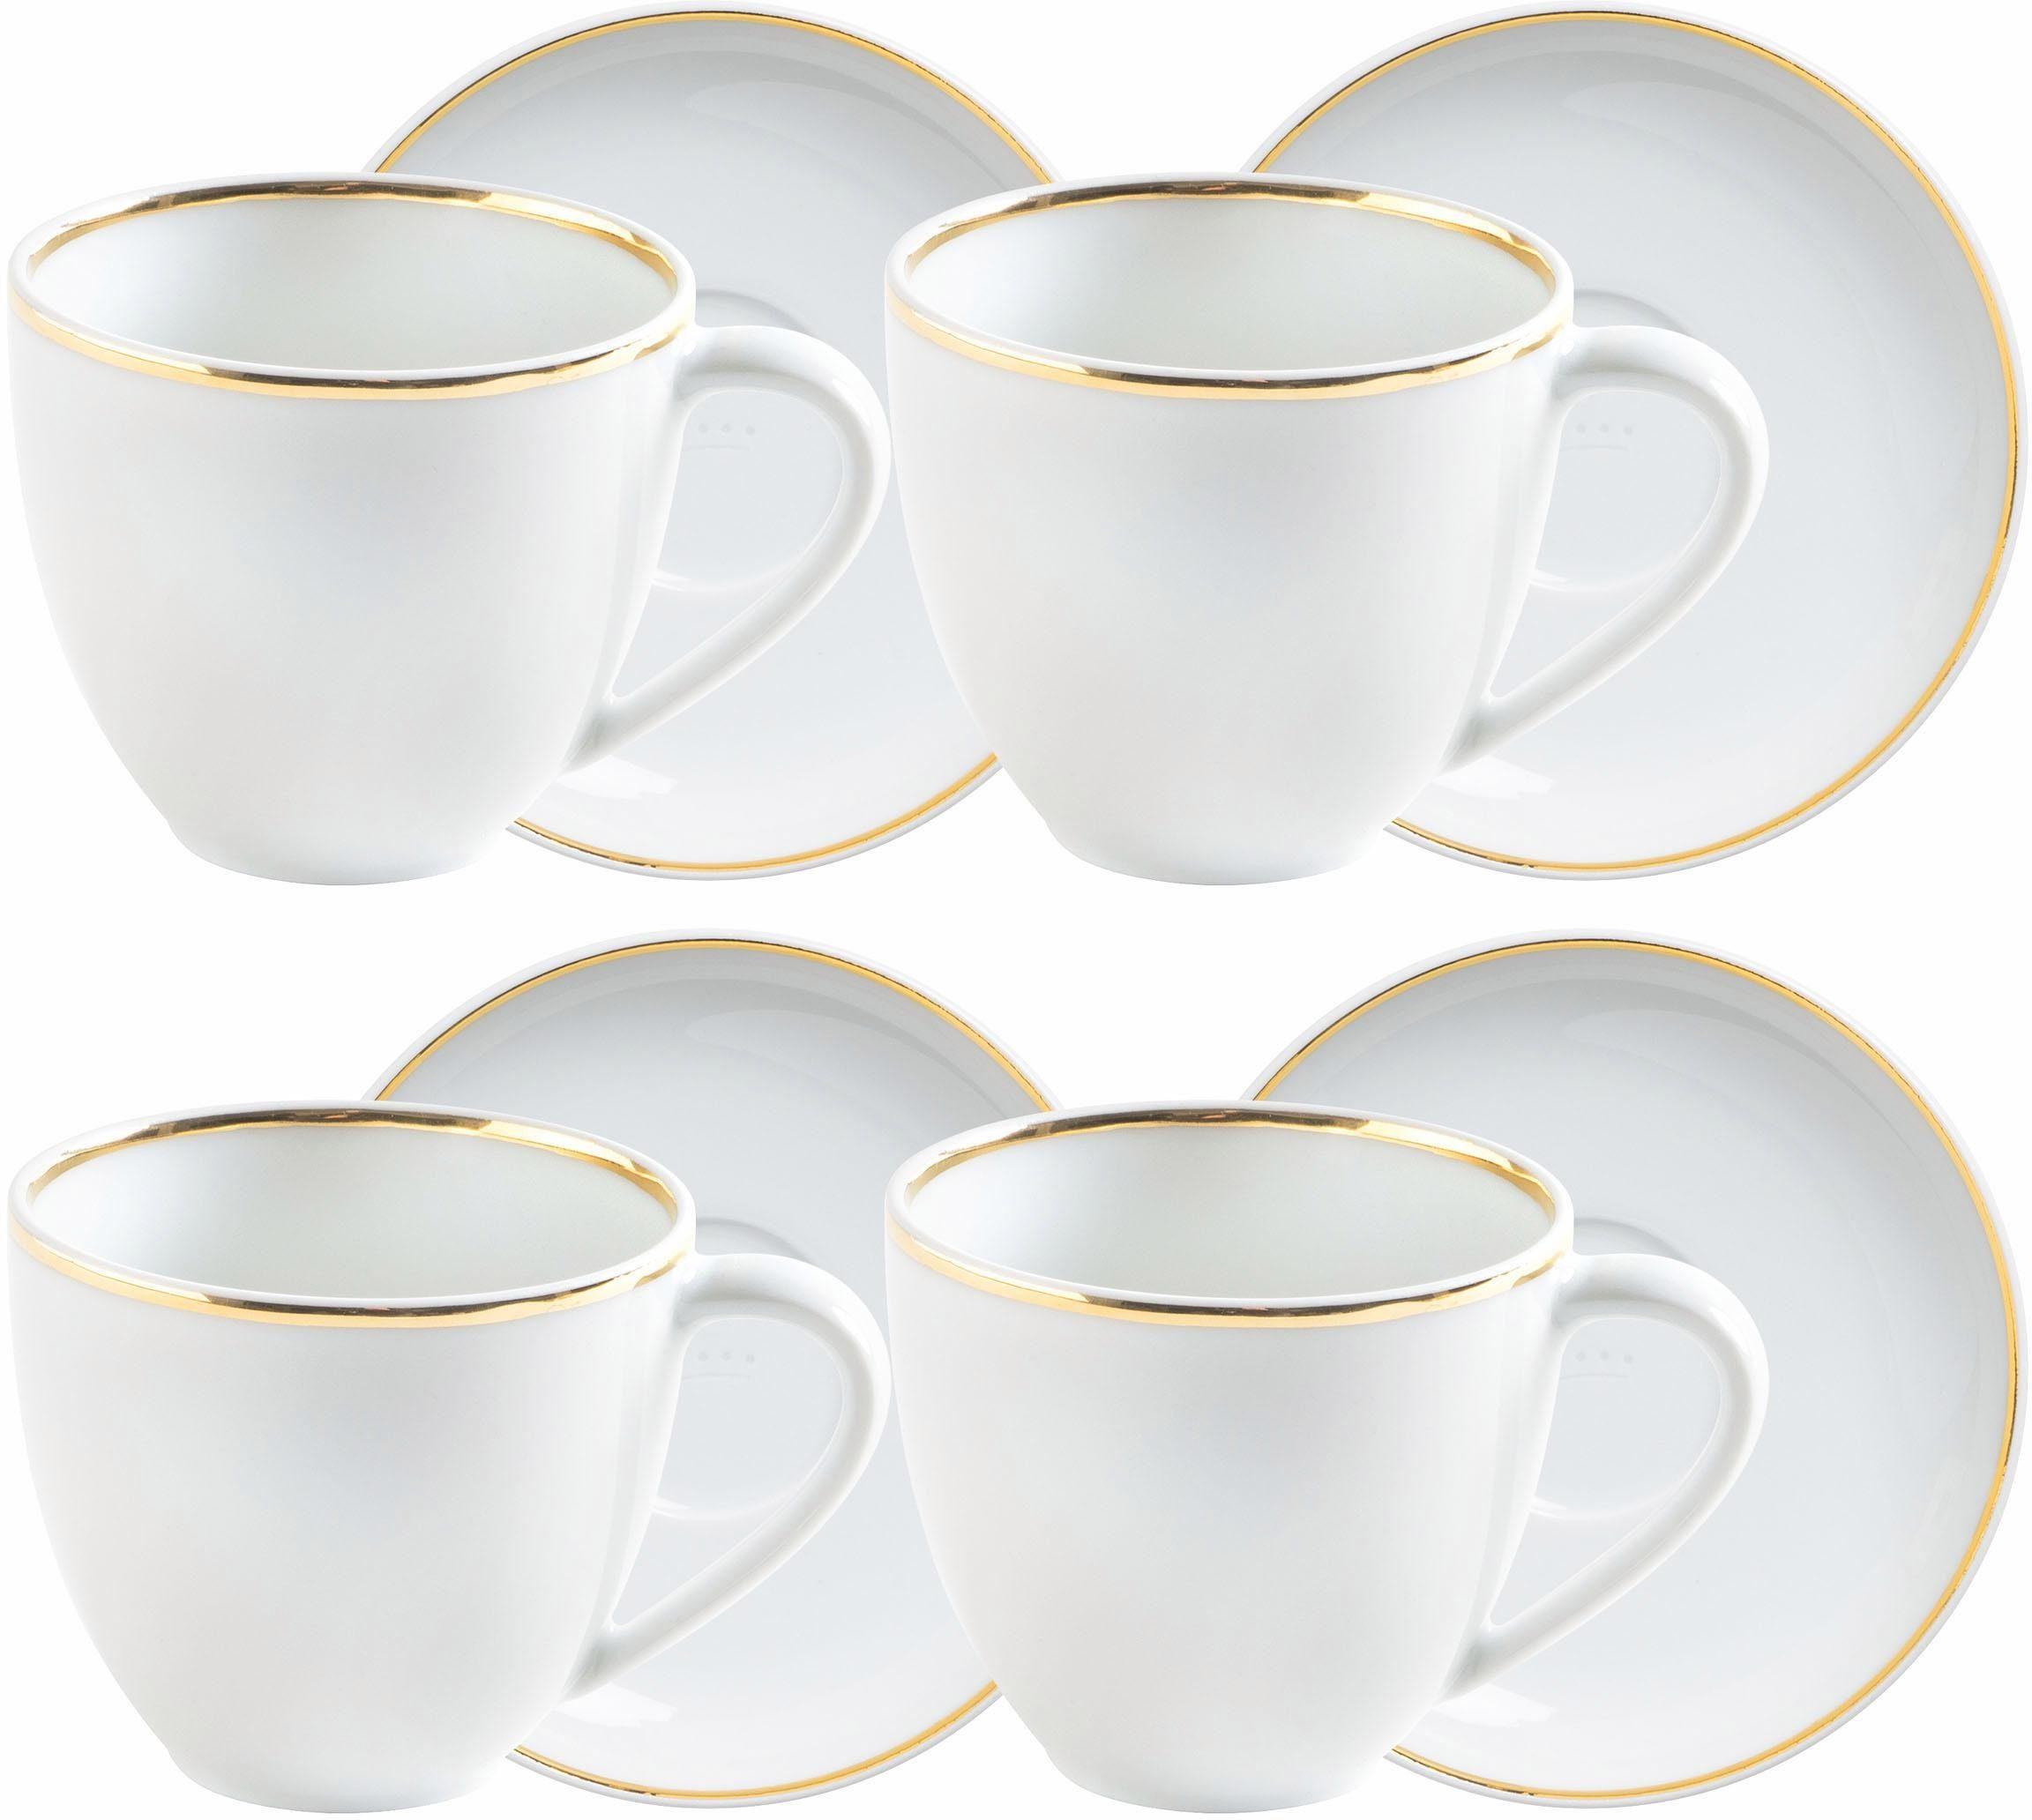 Kahla Espresso-Tassen-Set, Porzellan, 8-teilig, »Line of Gold«